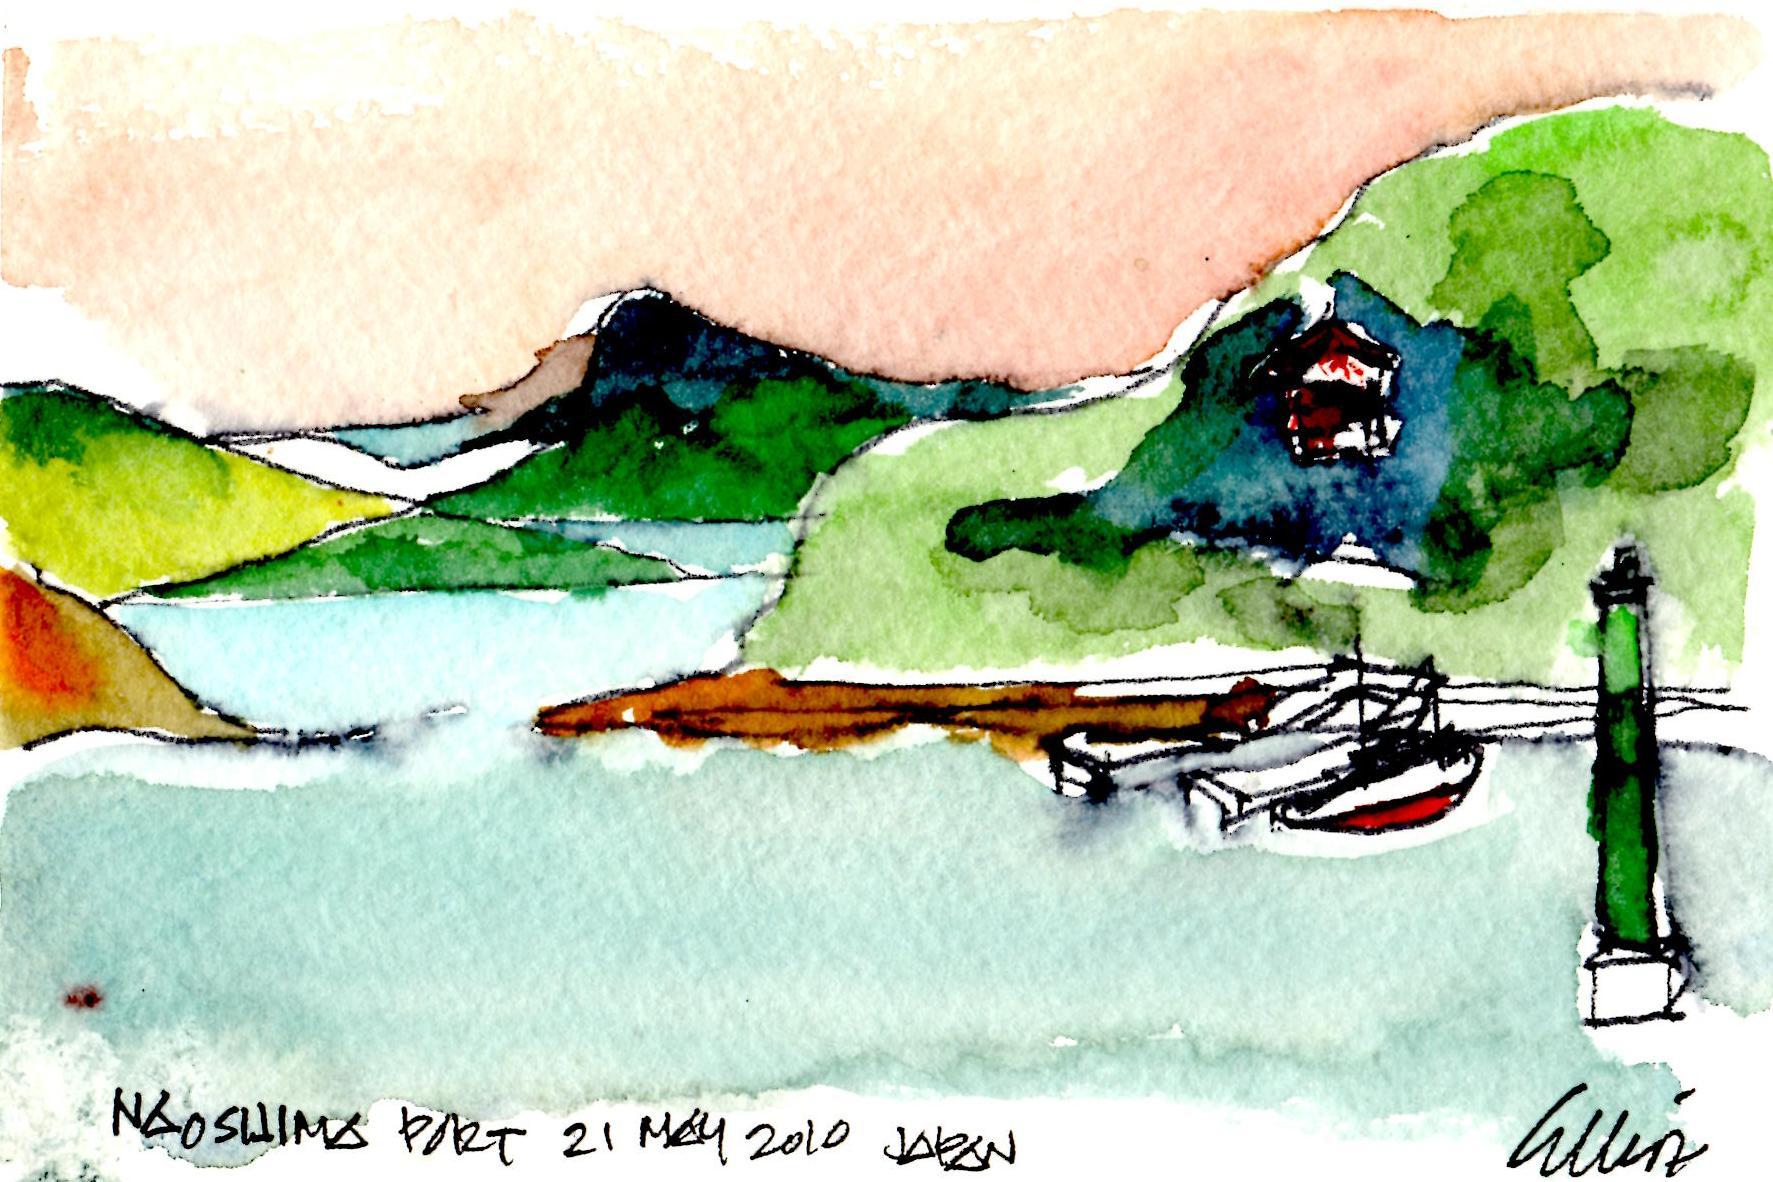 Naoshima Port